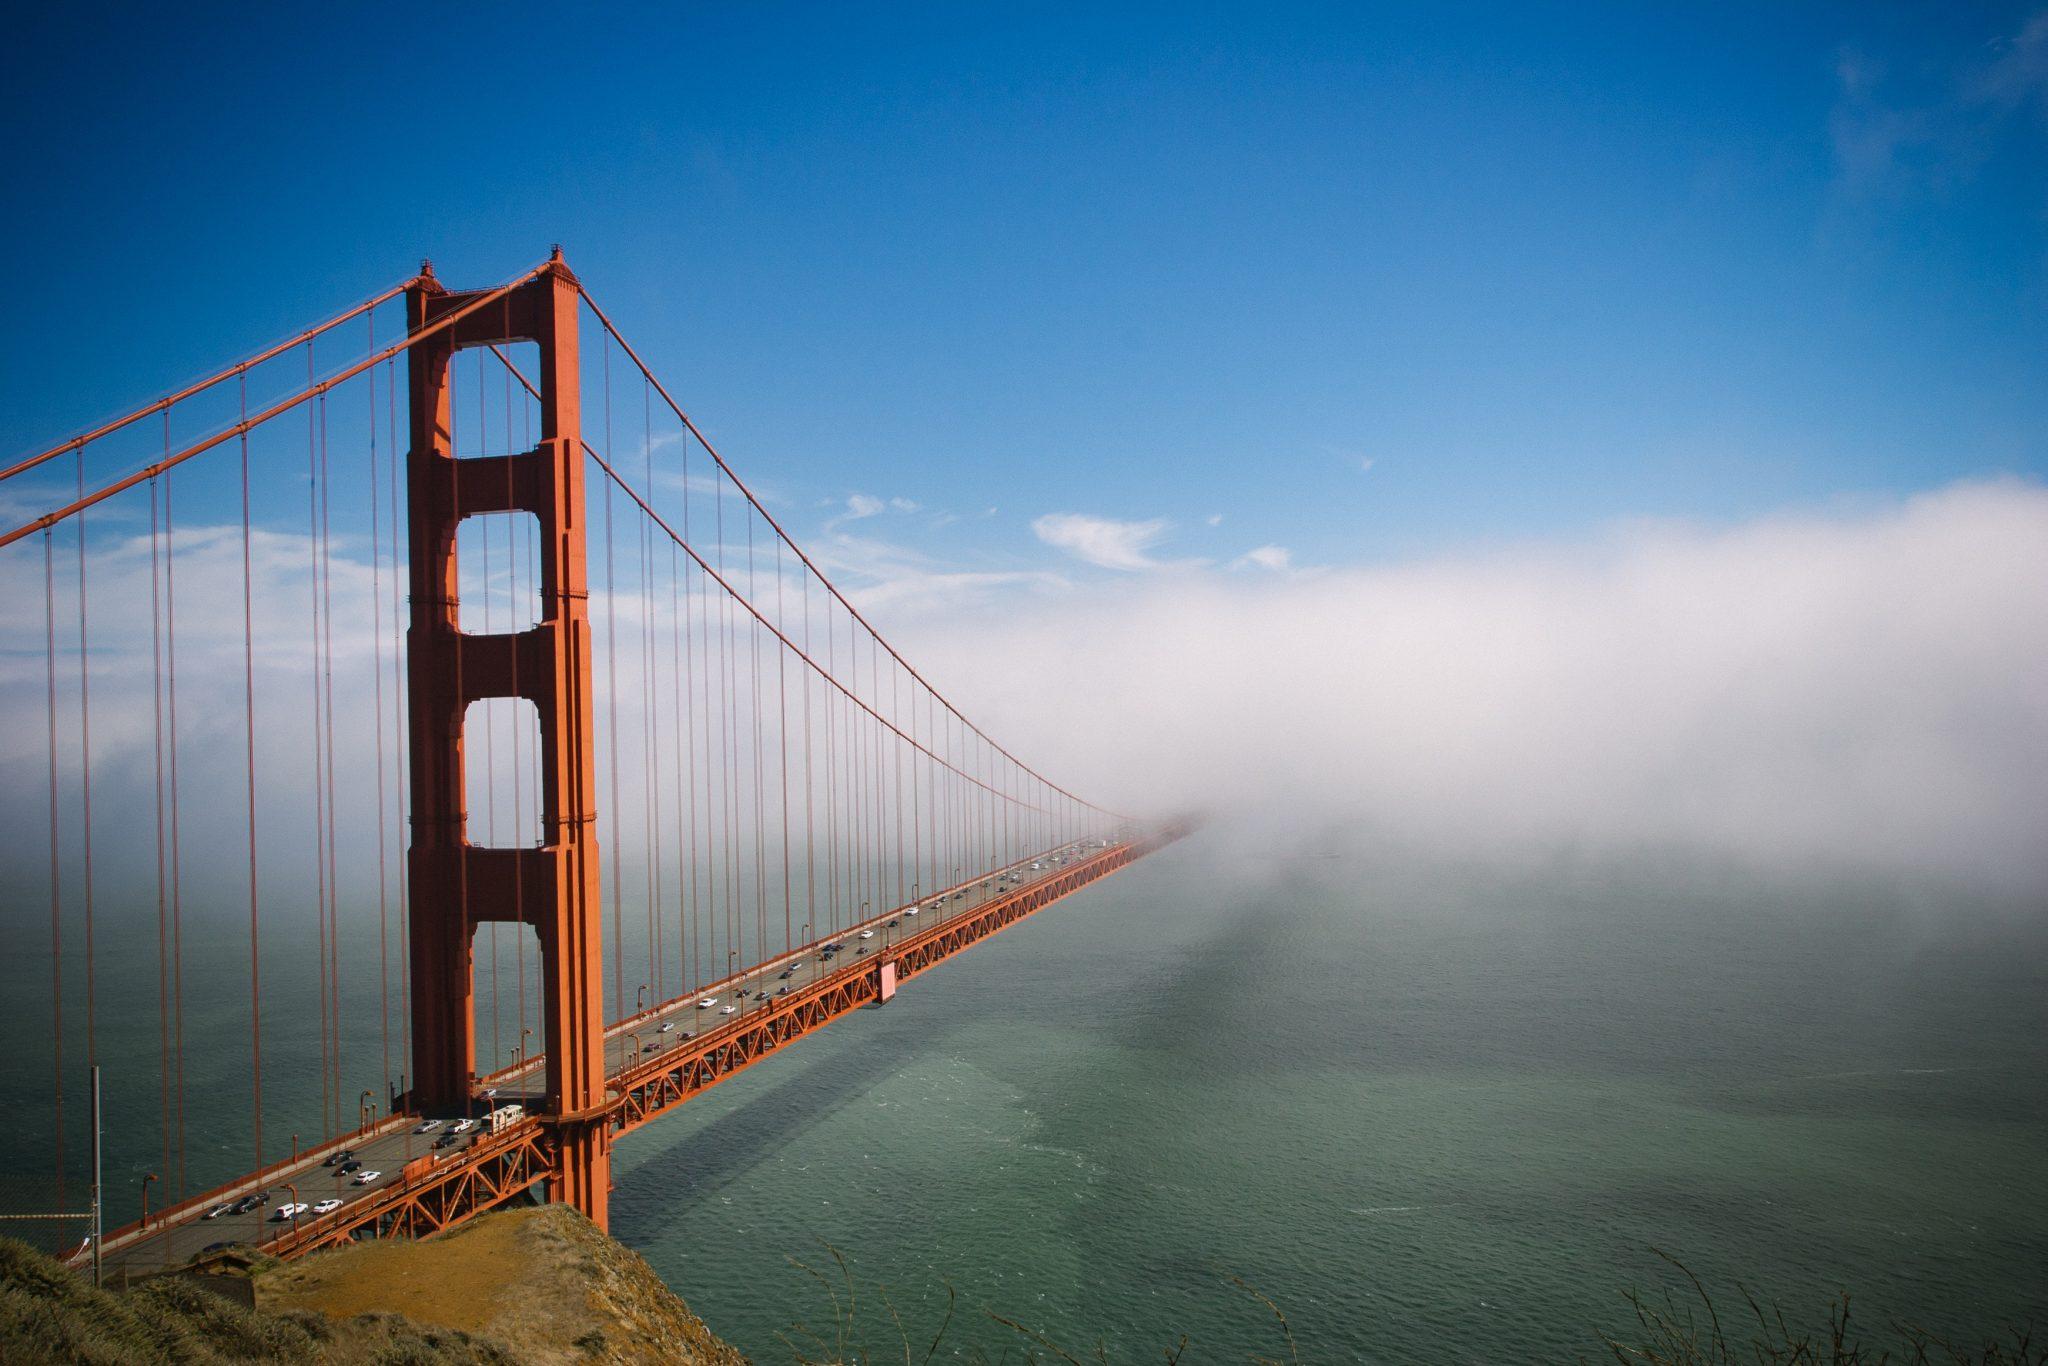 beach-blue-bridge-281184